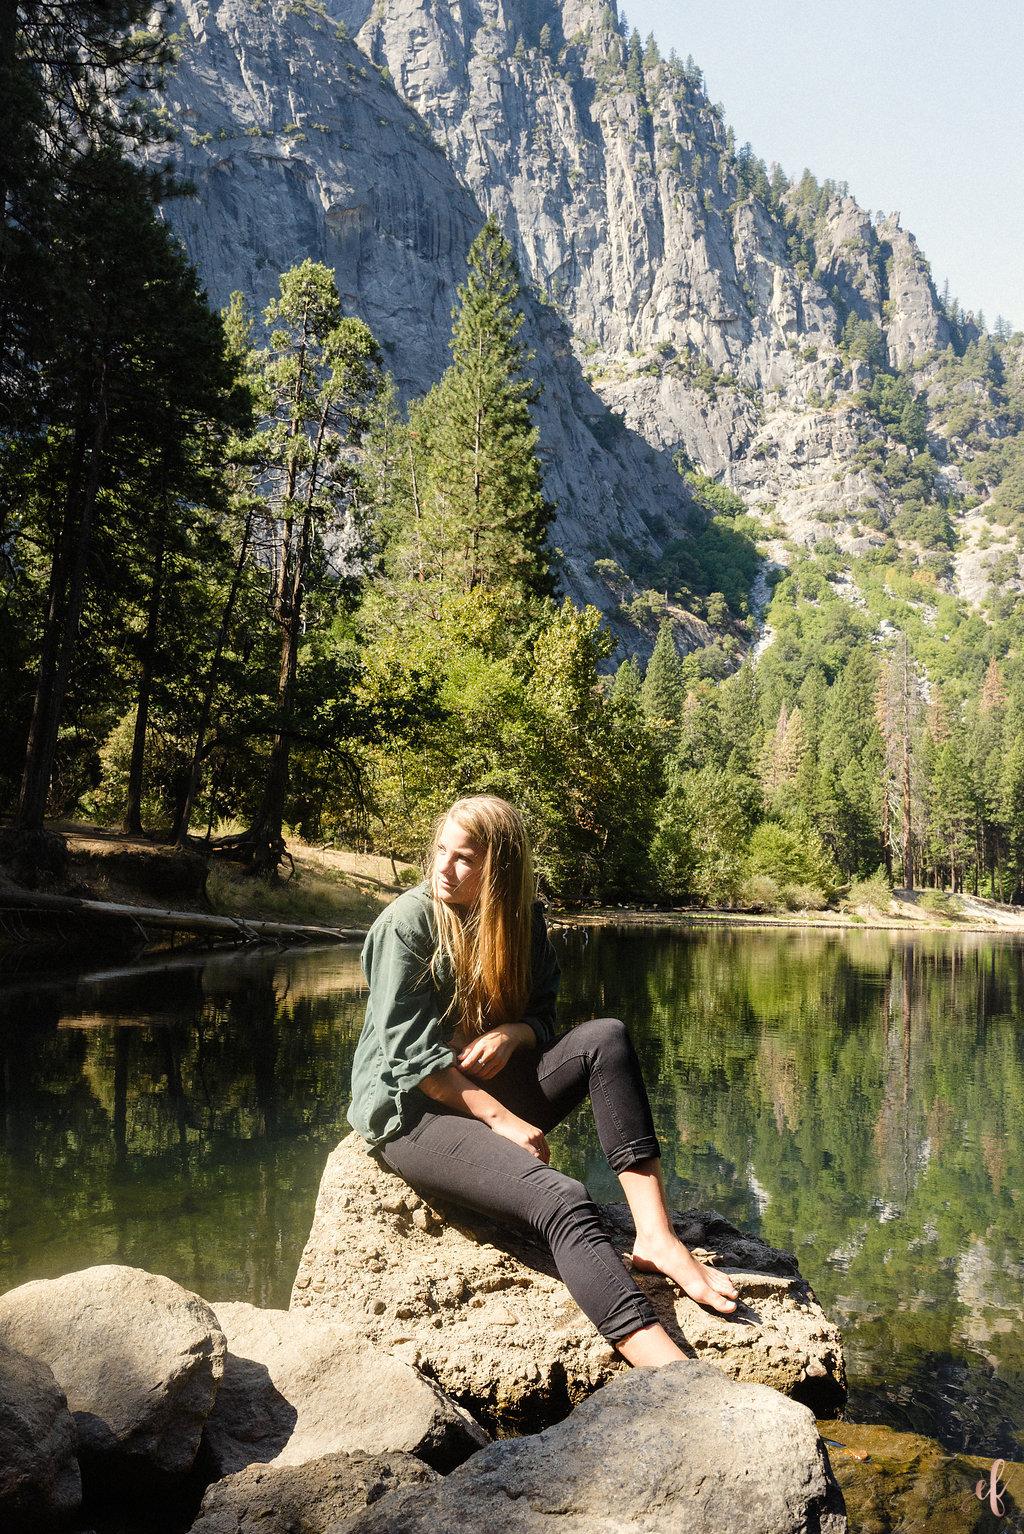 San Diego Senior Portrait Photography | Yosemite | San Marcos High School